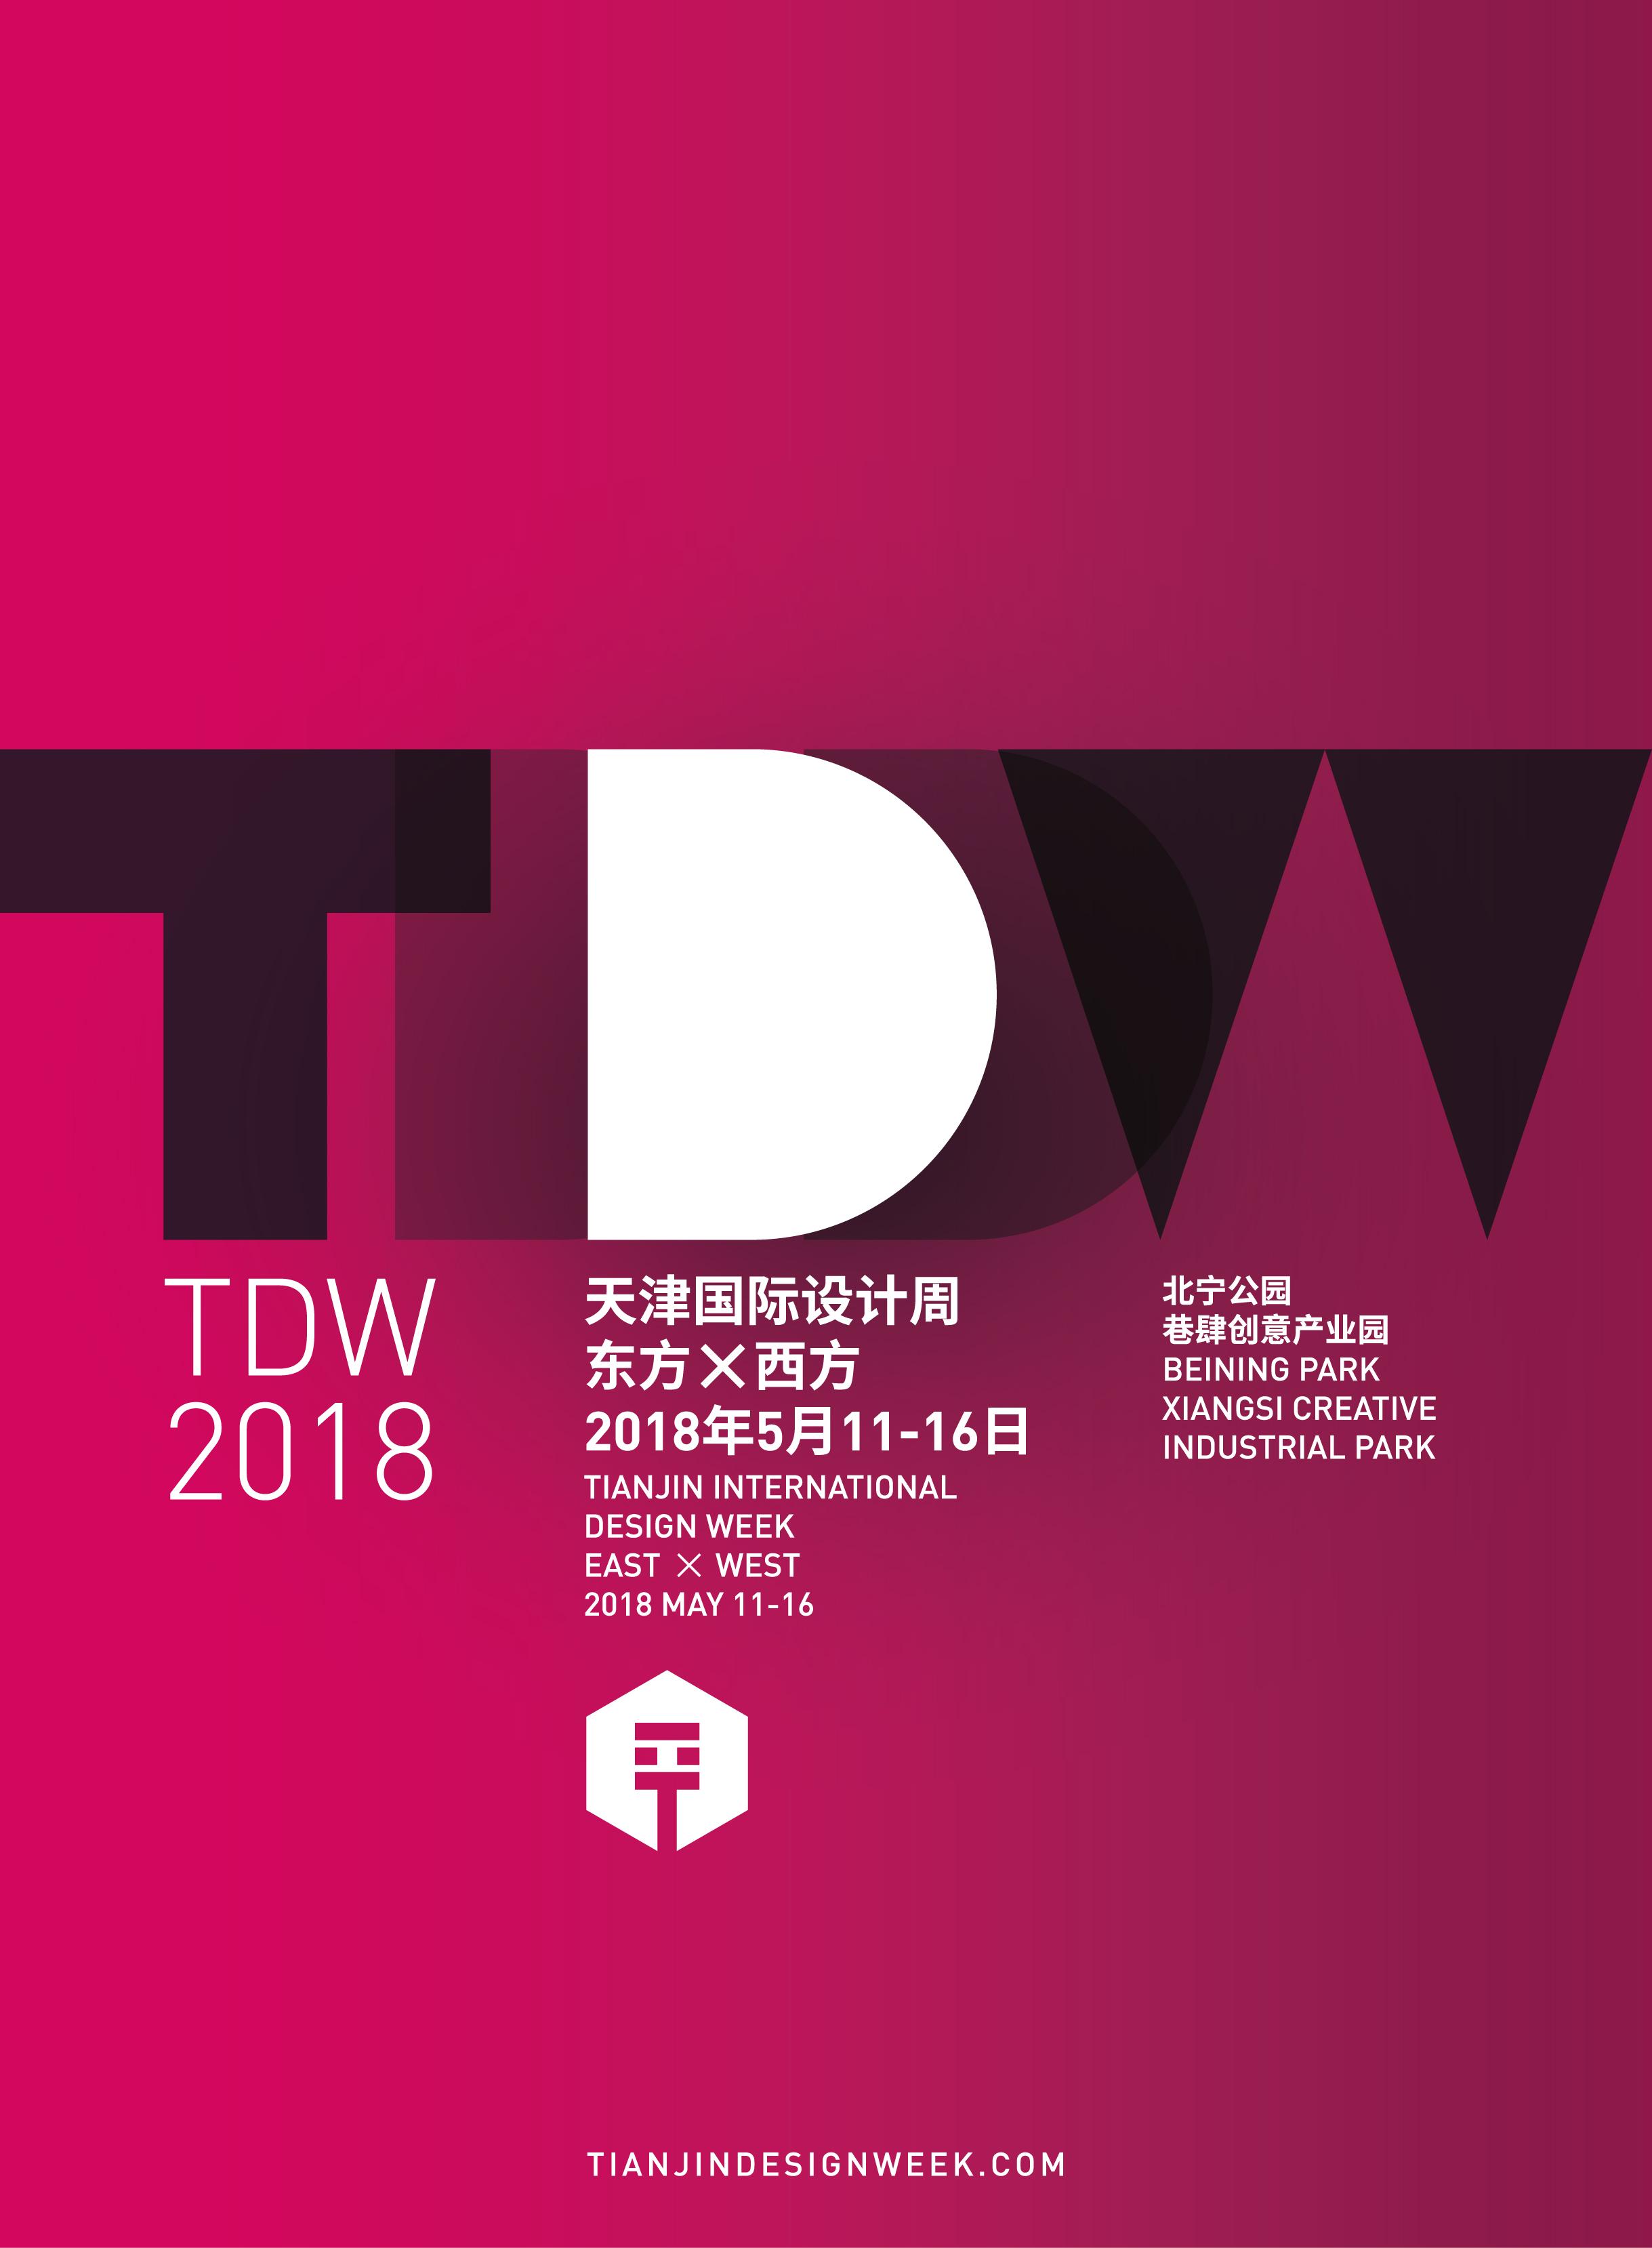 TDW2018_poster_TDW_WEB.jpg